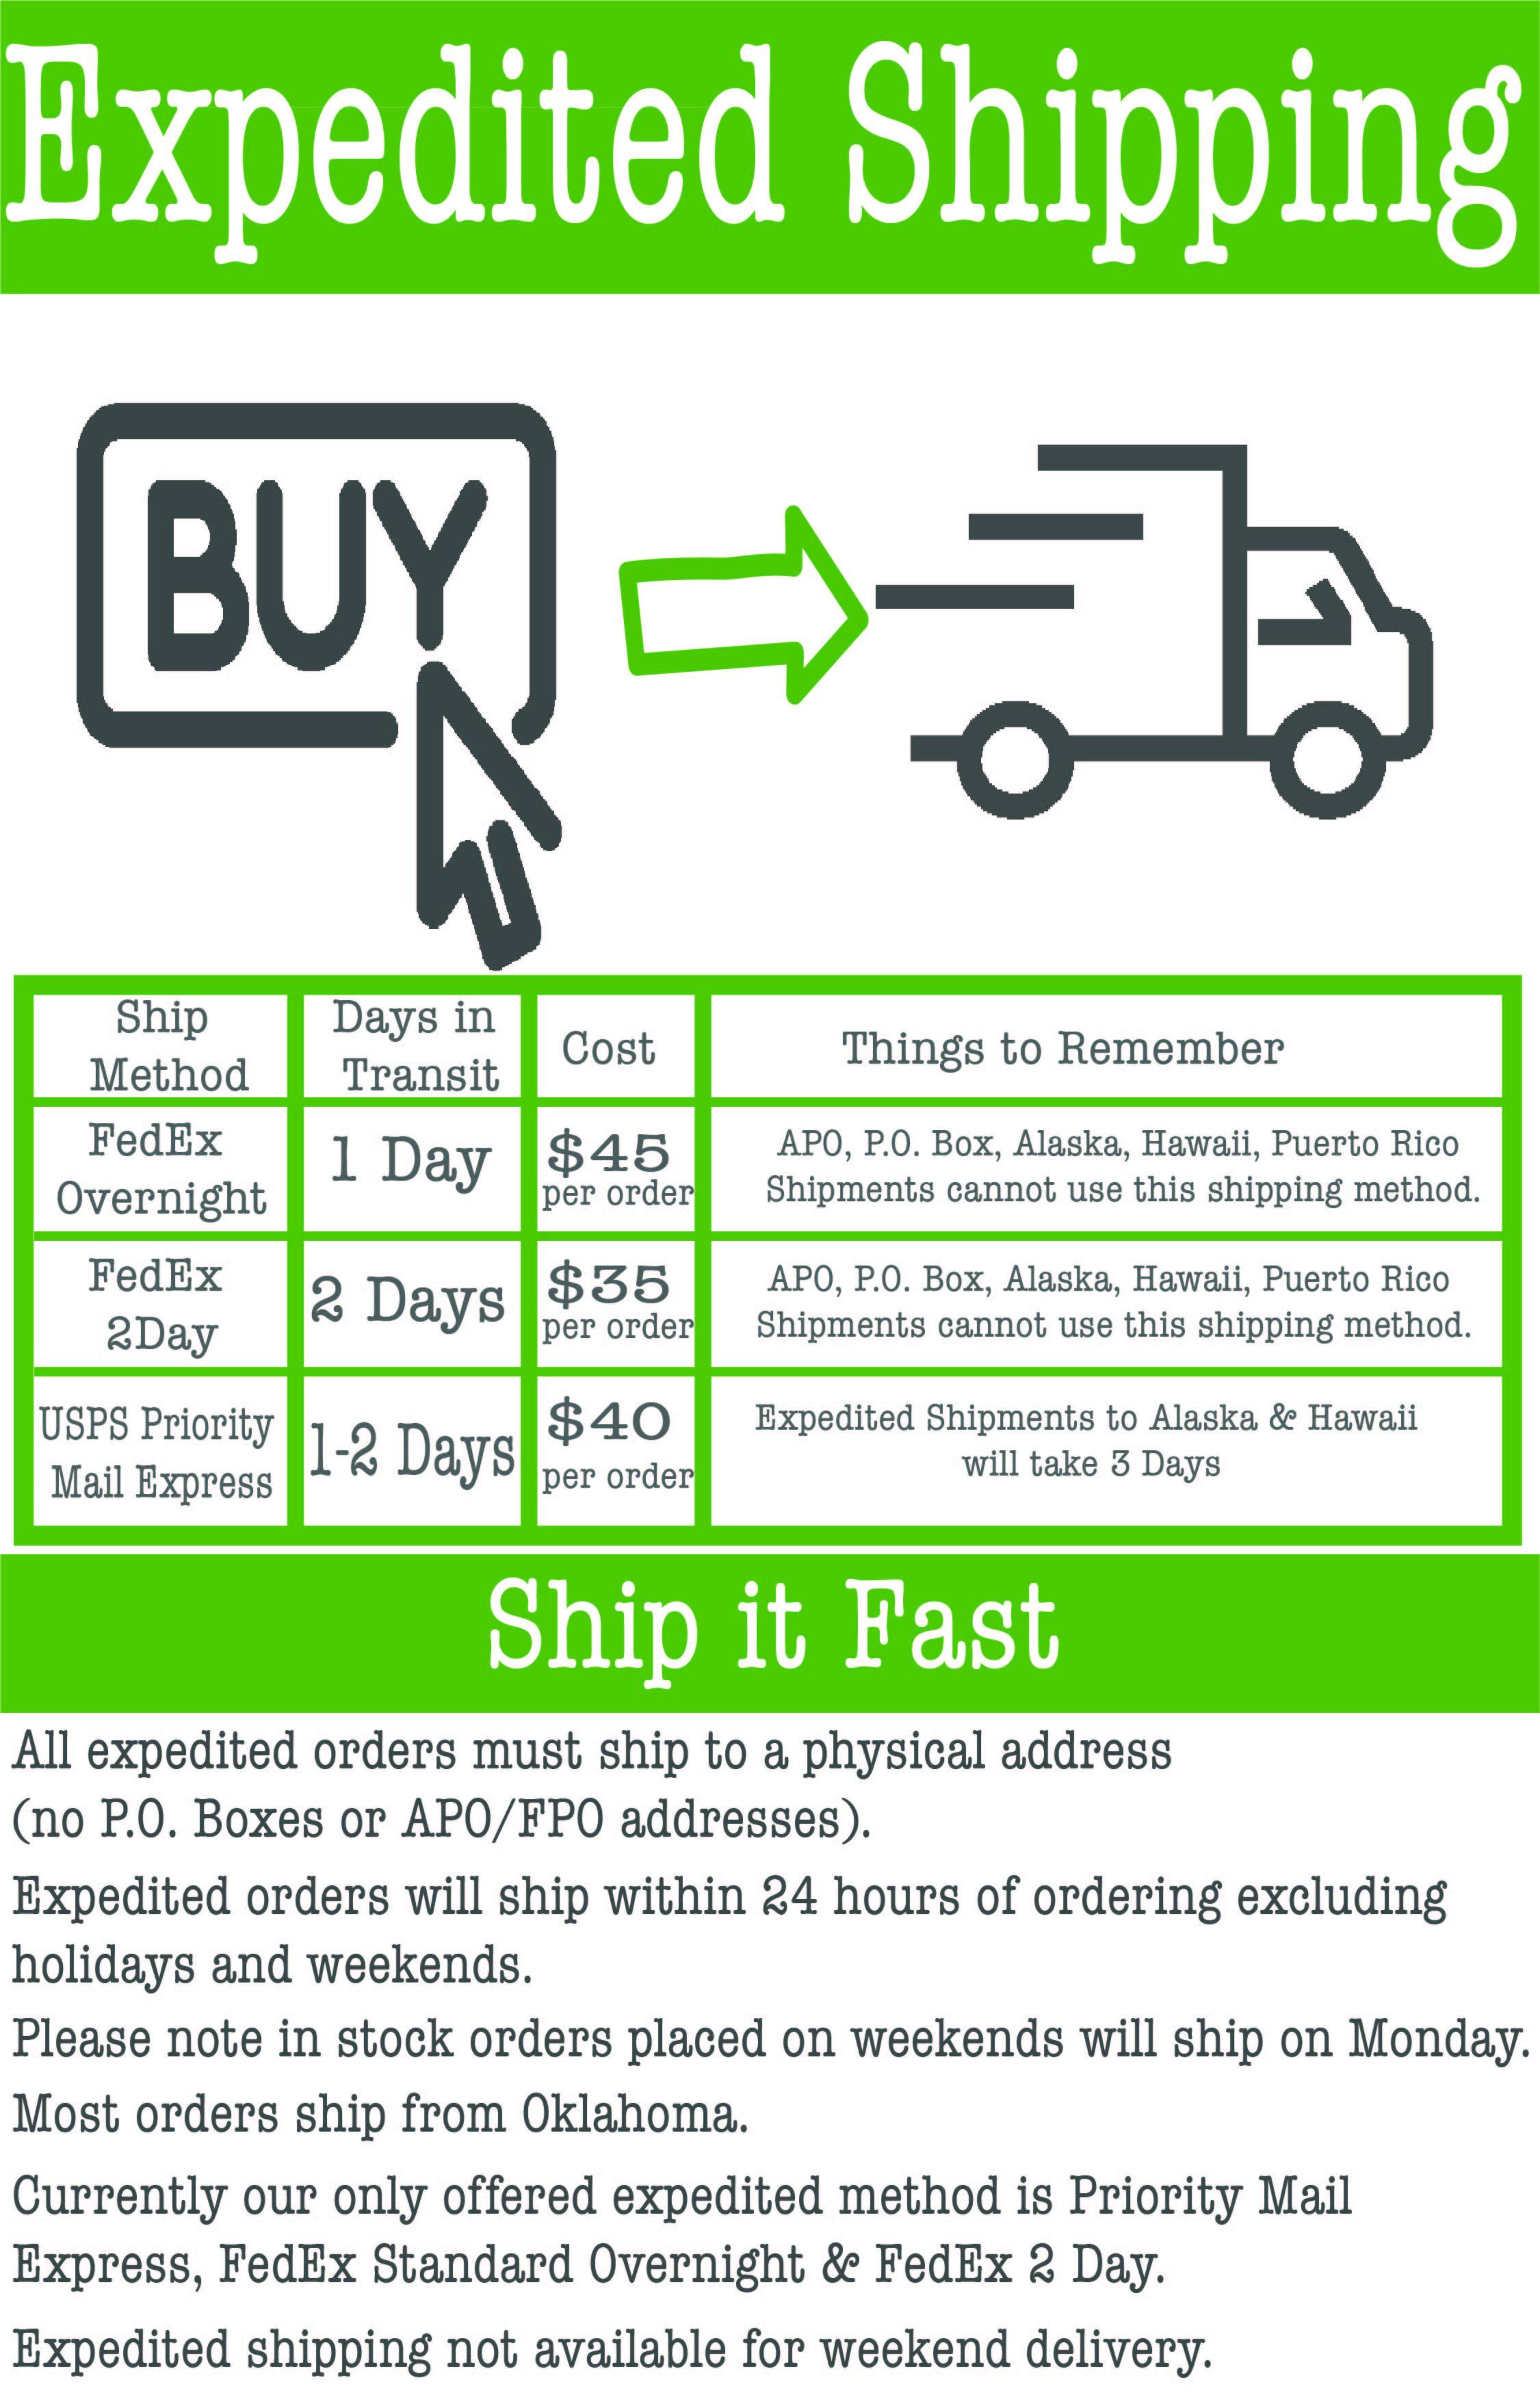 expedited-shipping-web.jpg